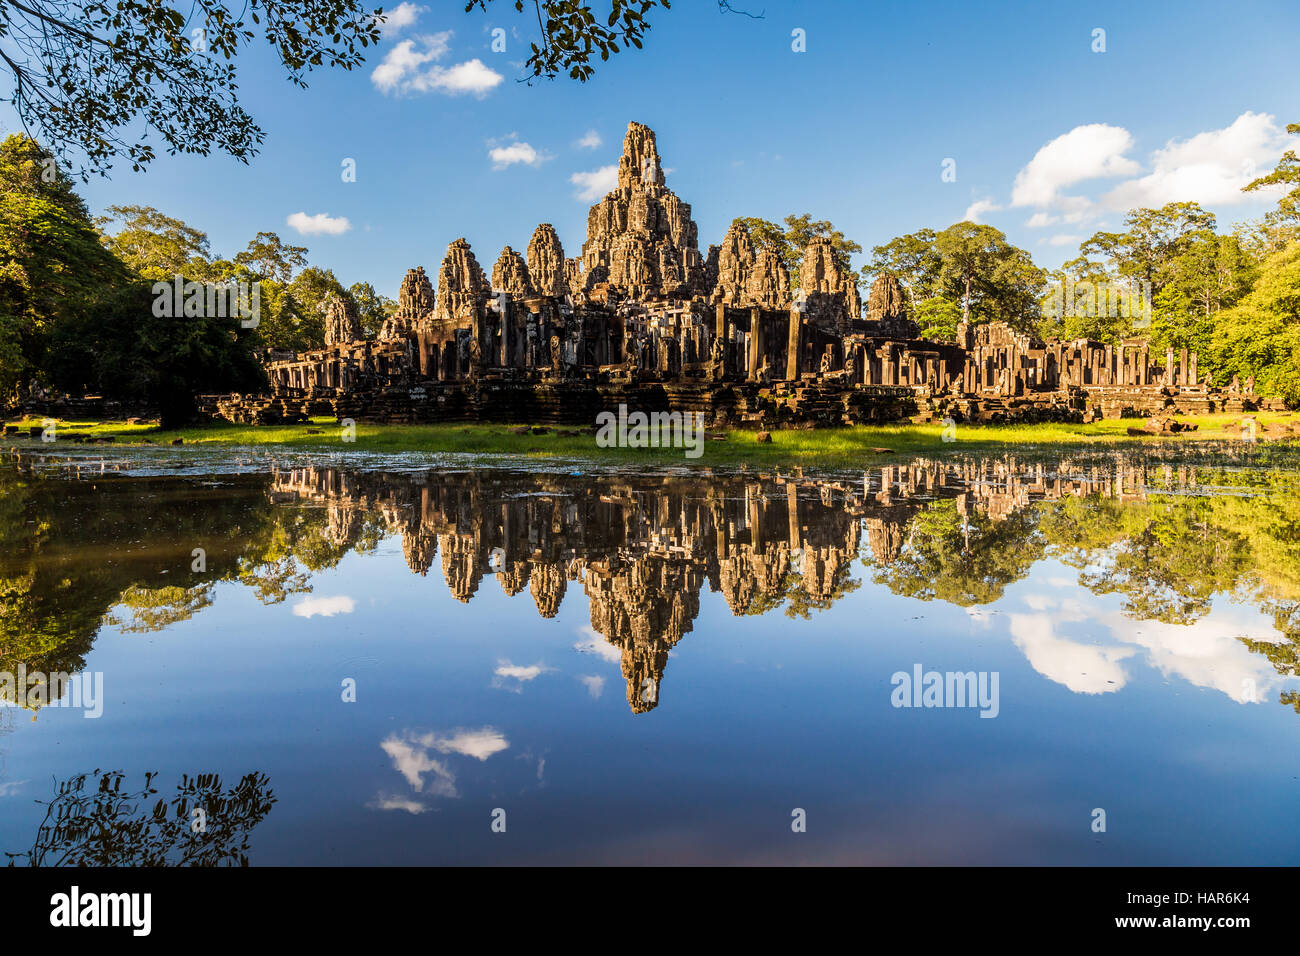 Angkor wat temple reflecting in a glassy lake - Stock Image